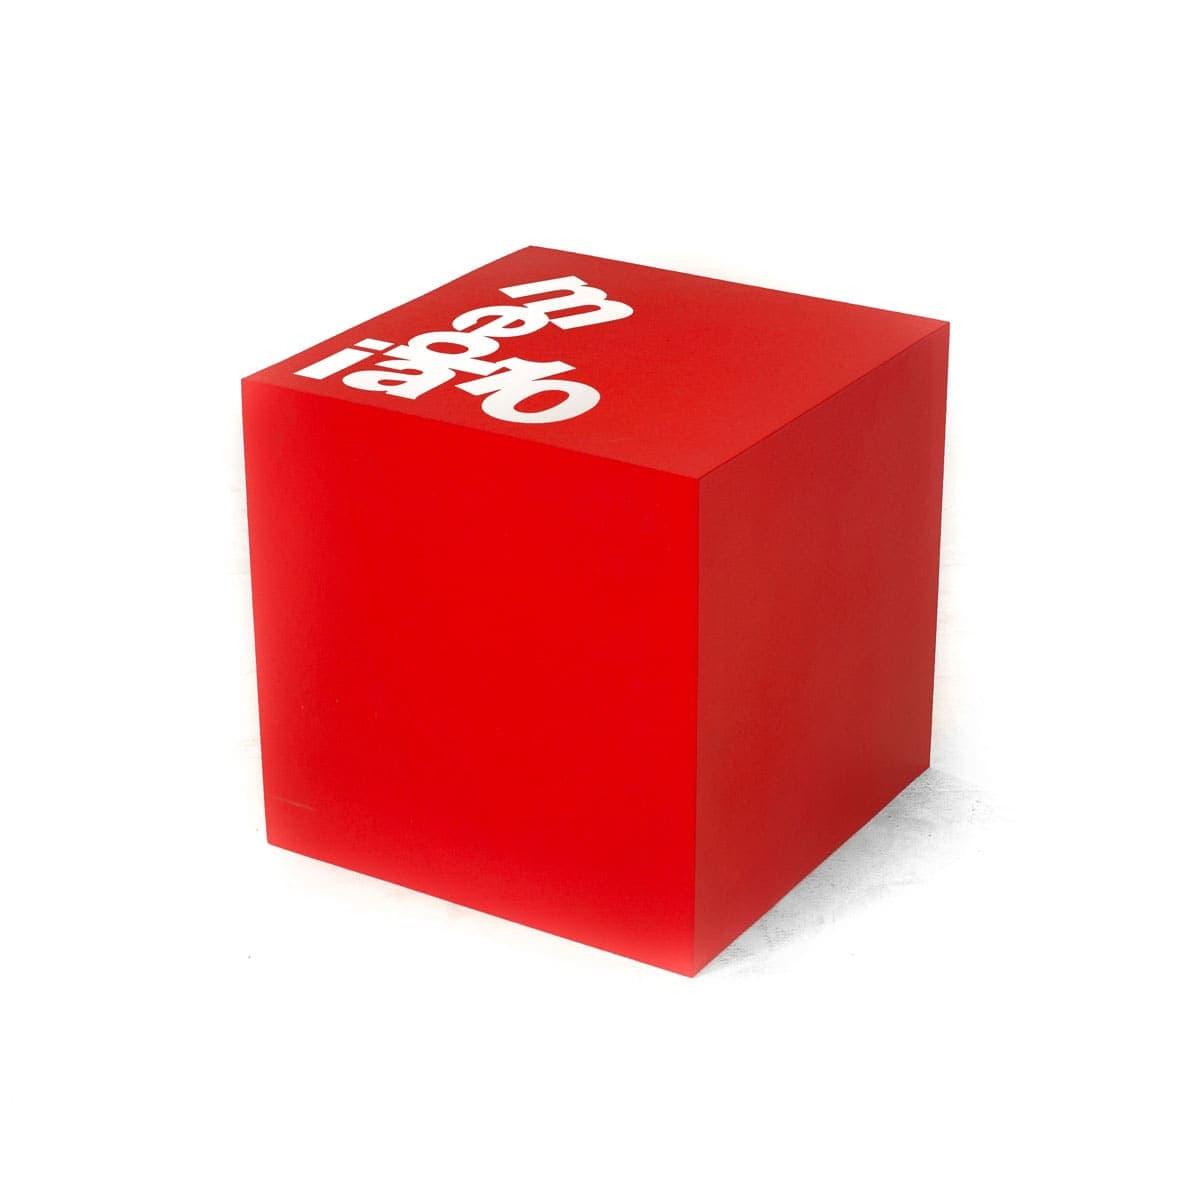 Block_Blocklet_branded_Media10_